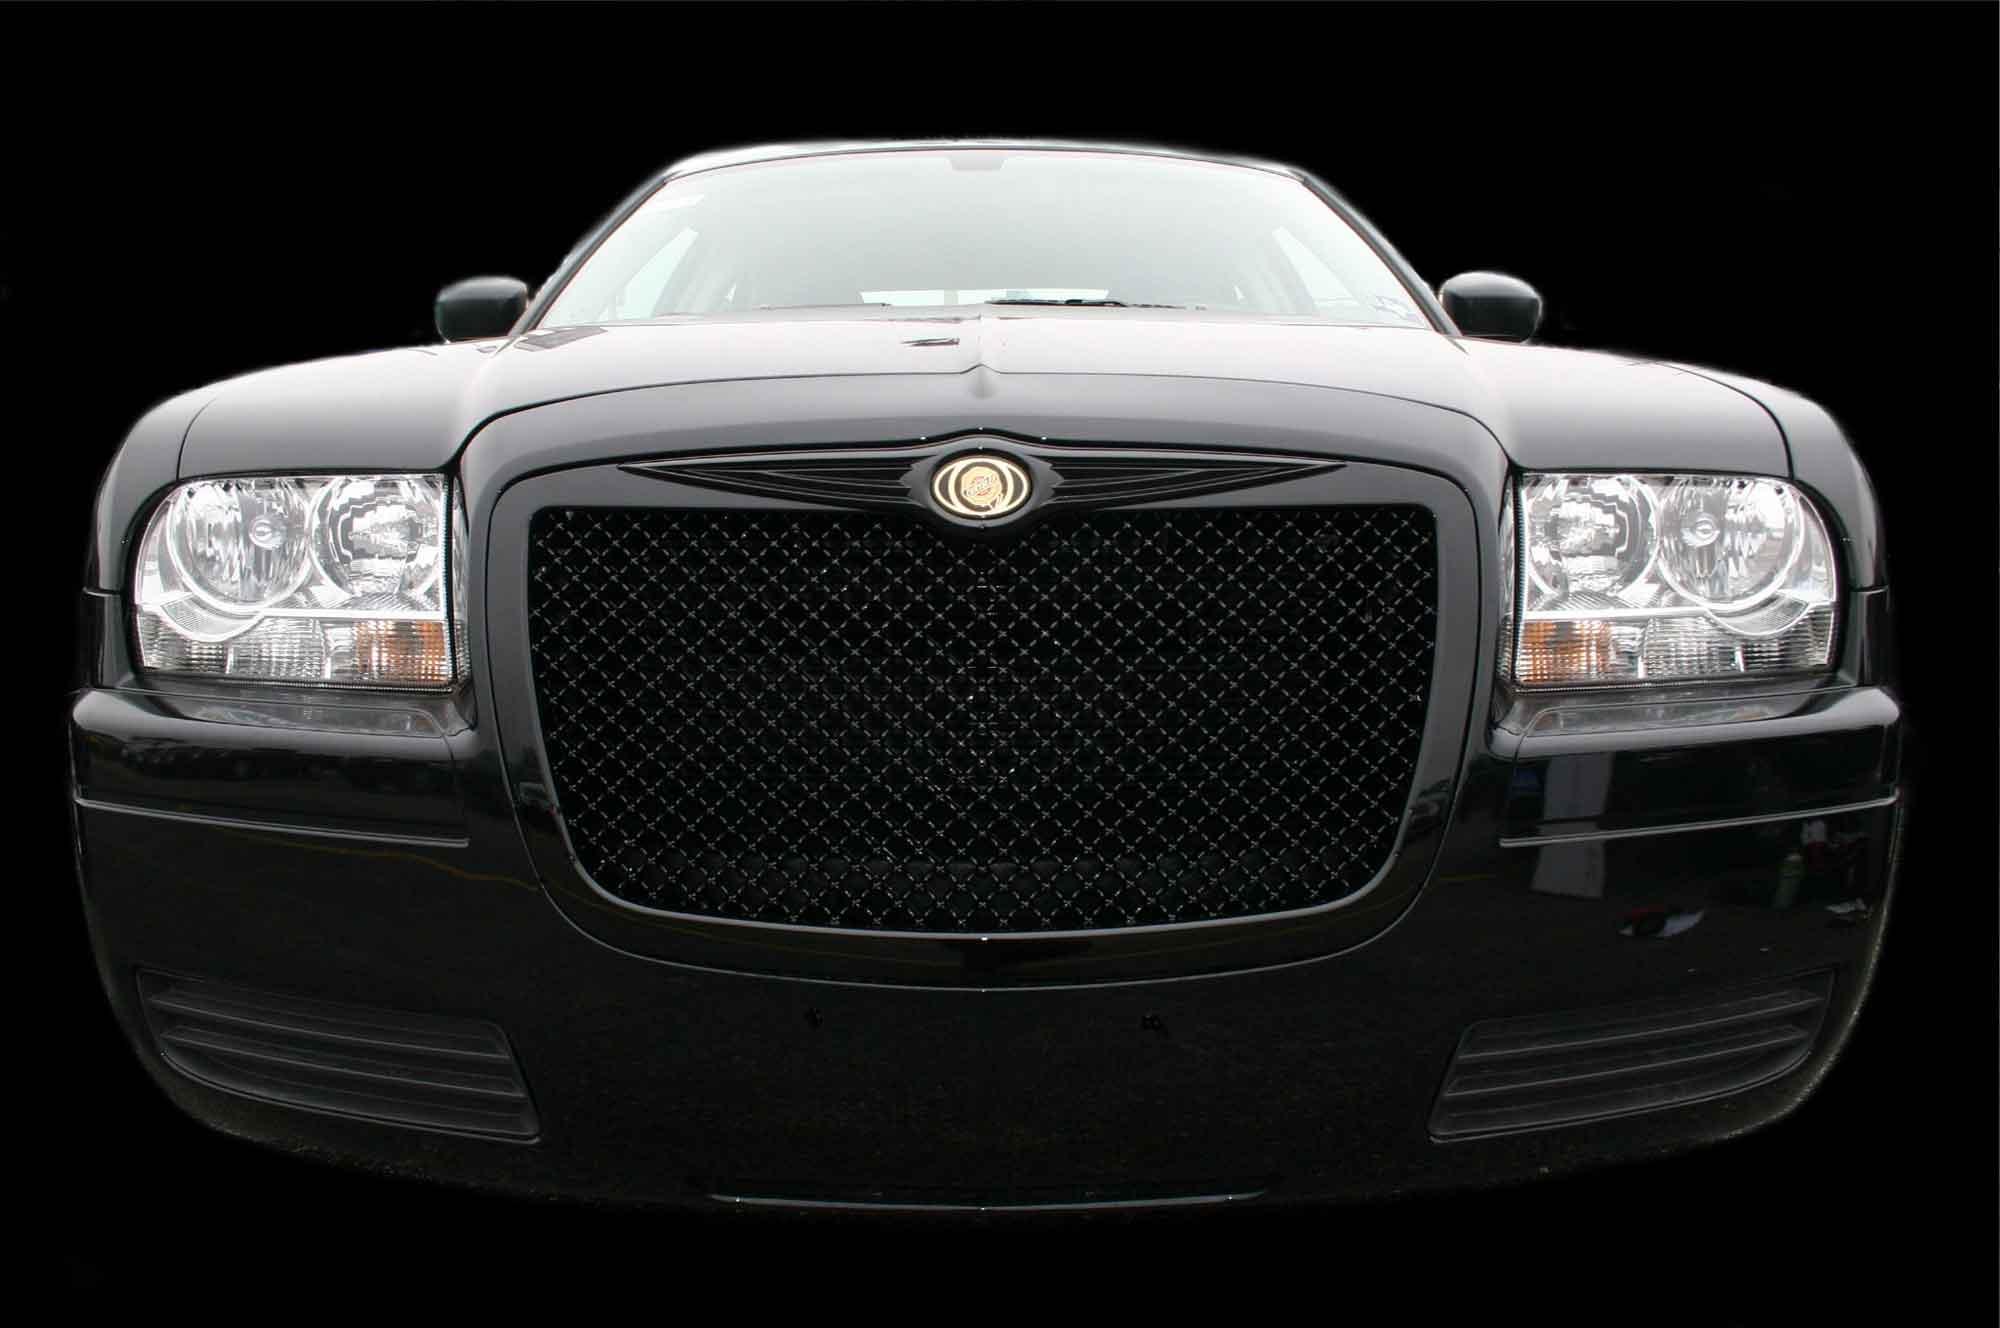 Chrysler Black Chrome Bentley Mesh Grille Grill Trim Molding